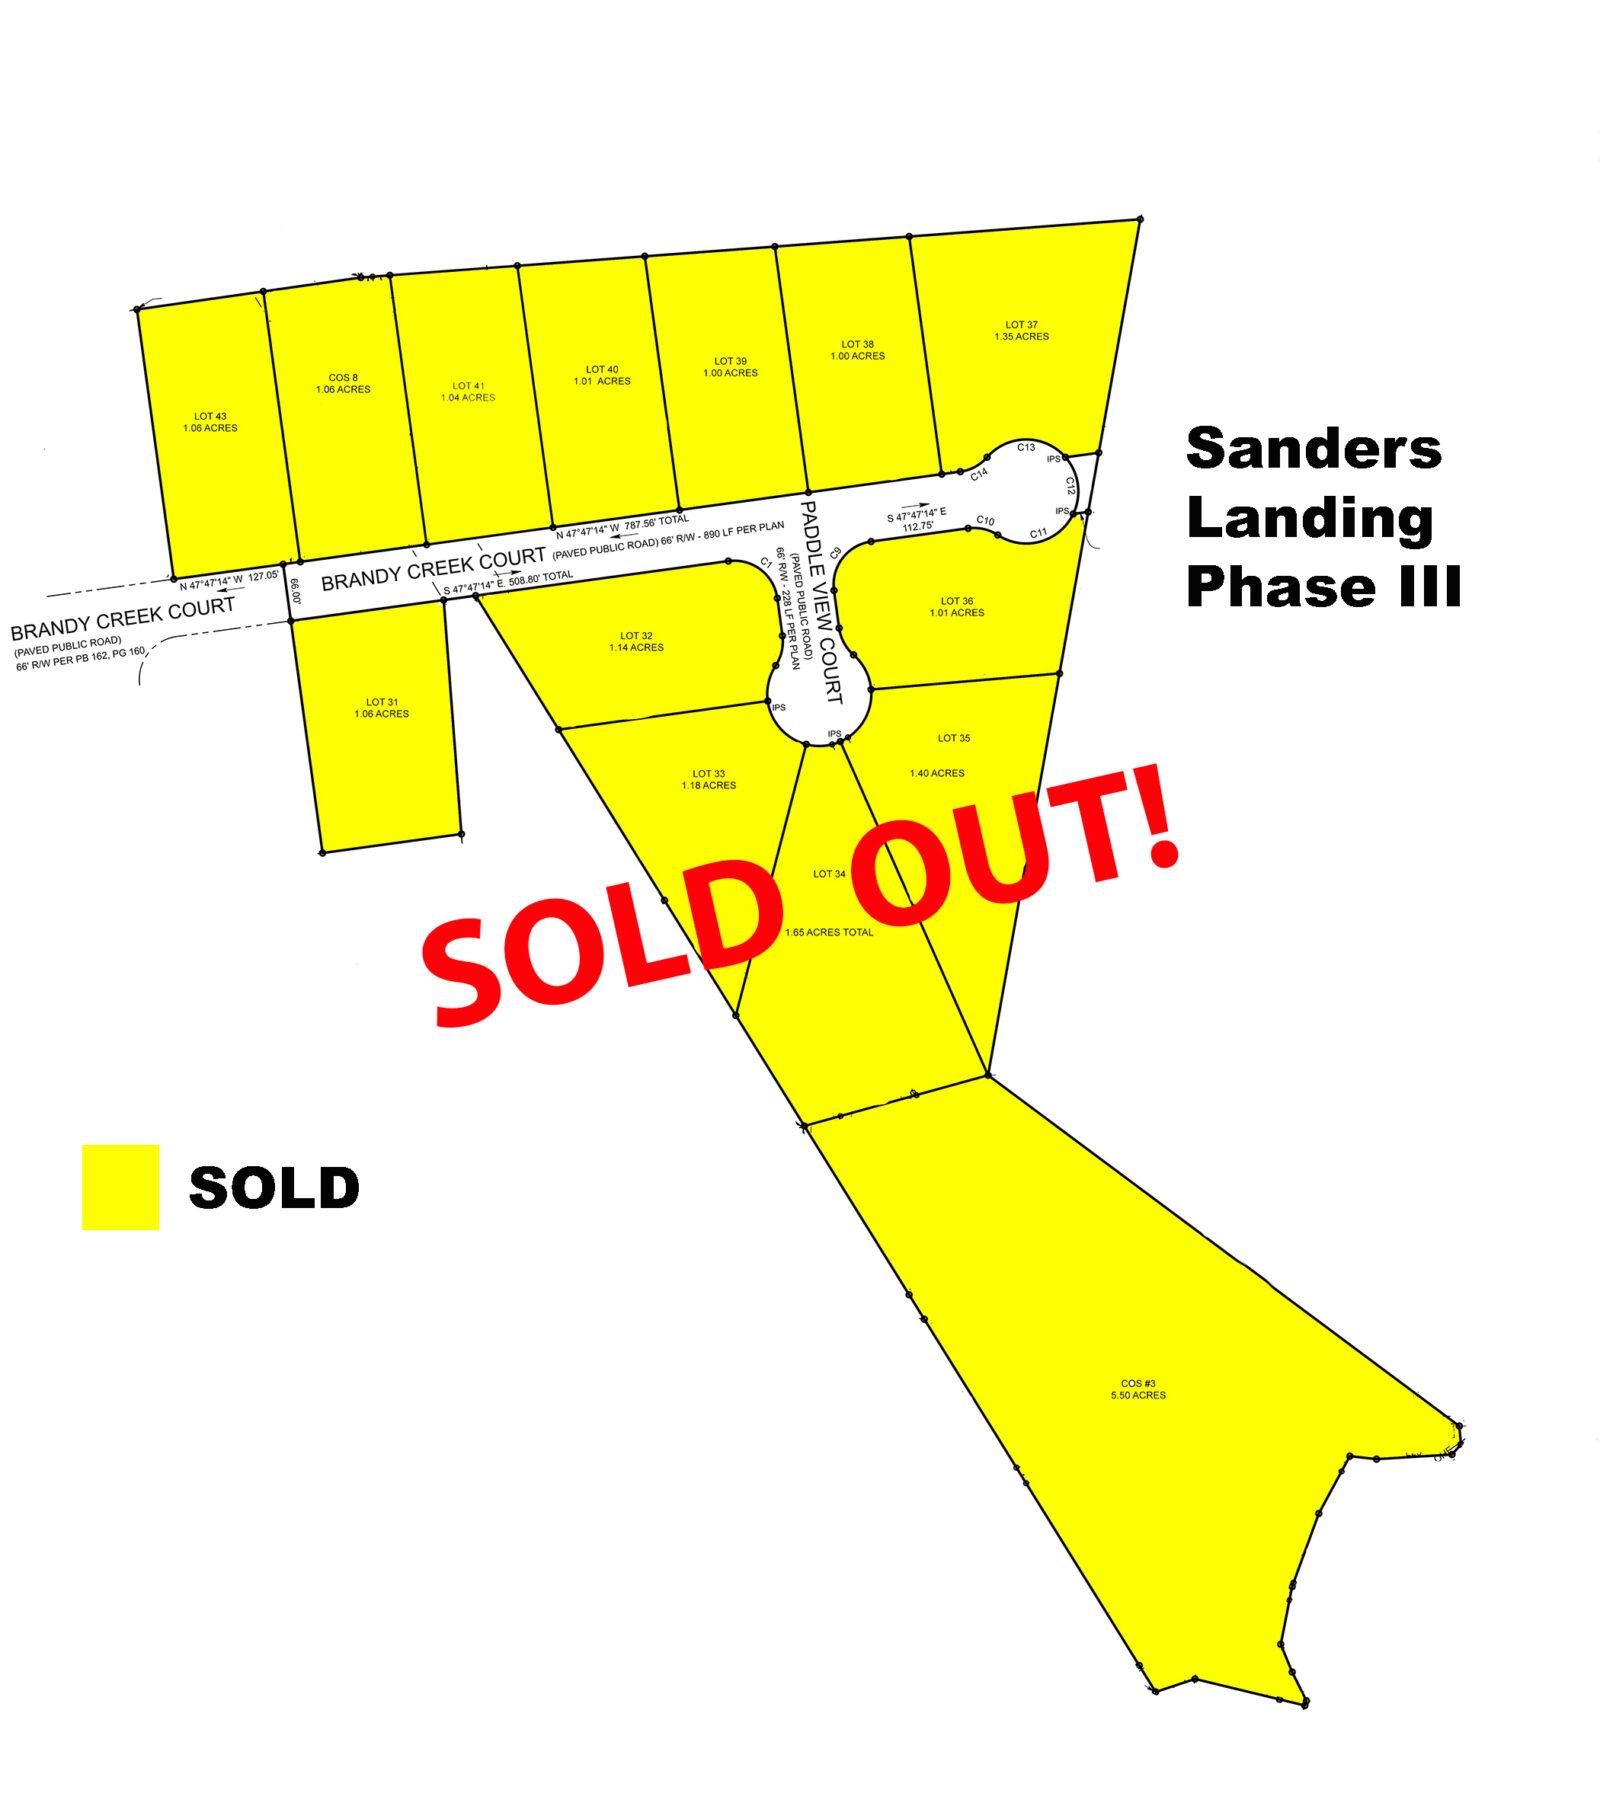 Sanders Ph 3 prelim - sold